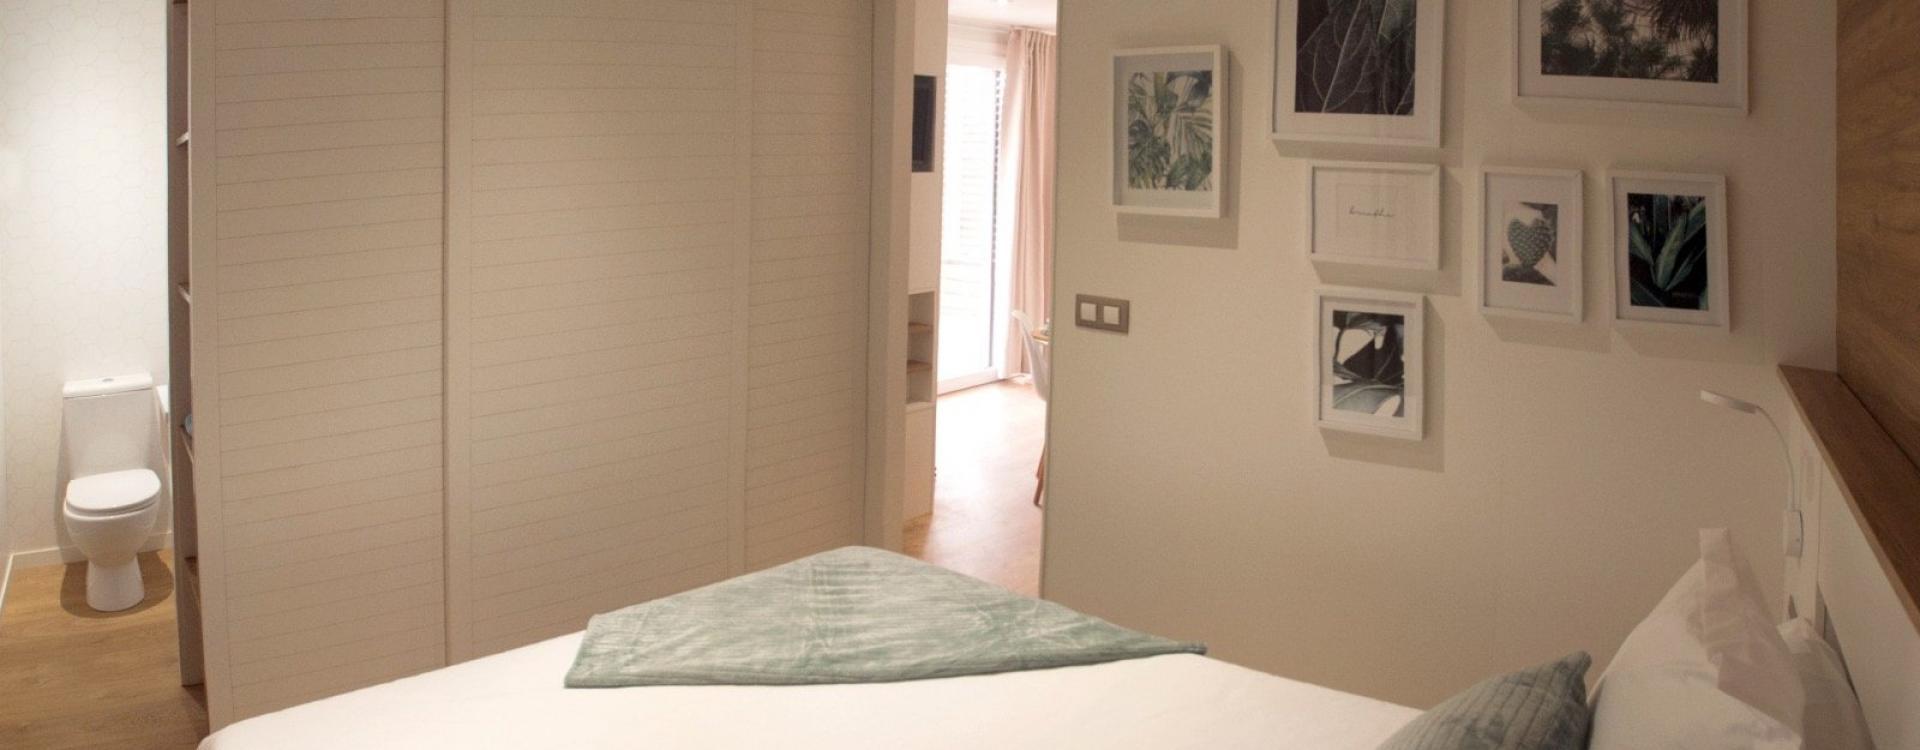 optimitzades/bungalows/cavall-bernat/habitacion-suite-bungalow-valldaro.JPG